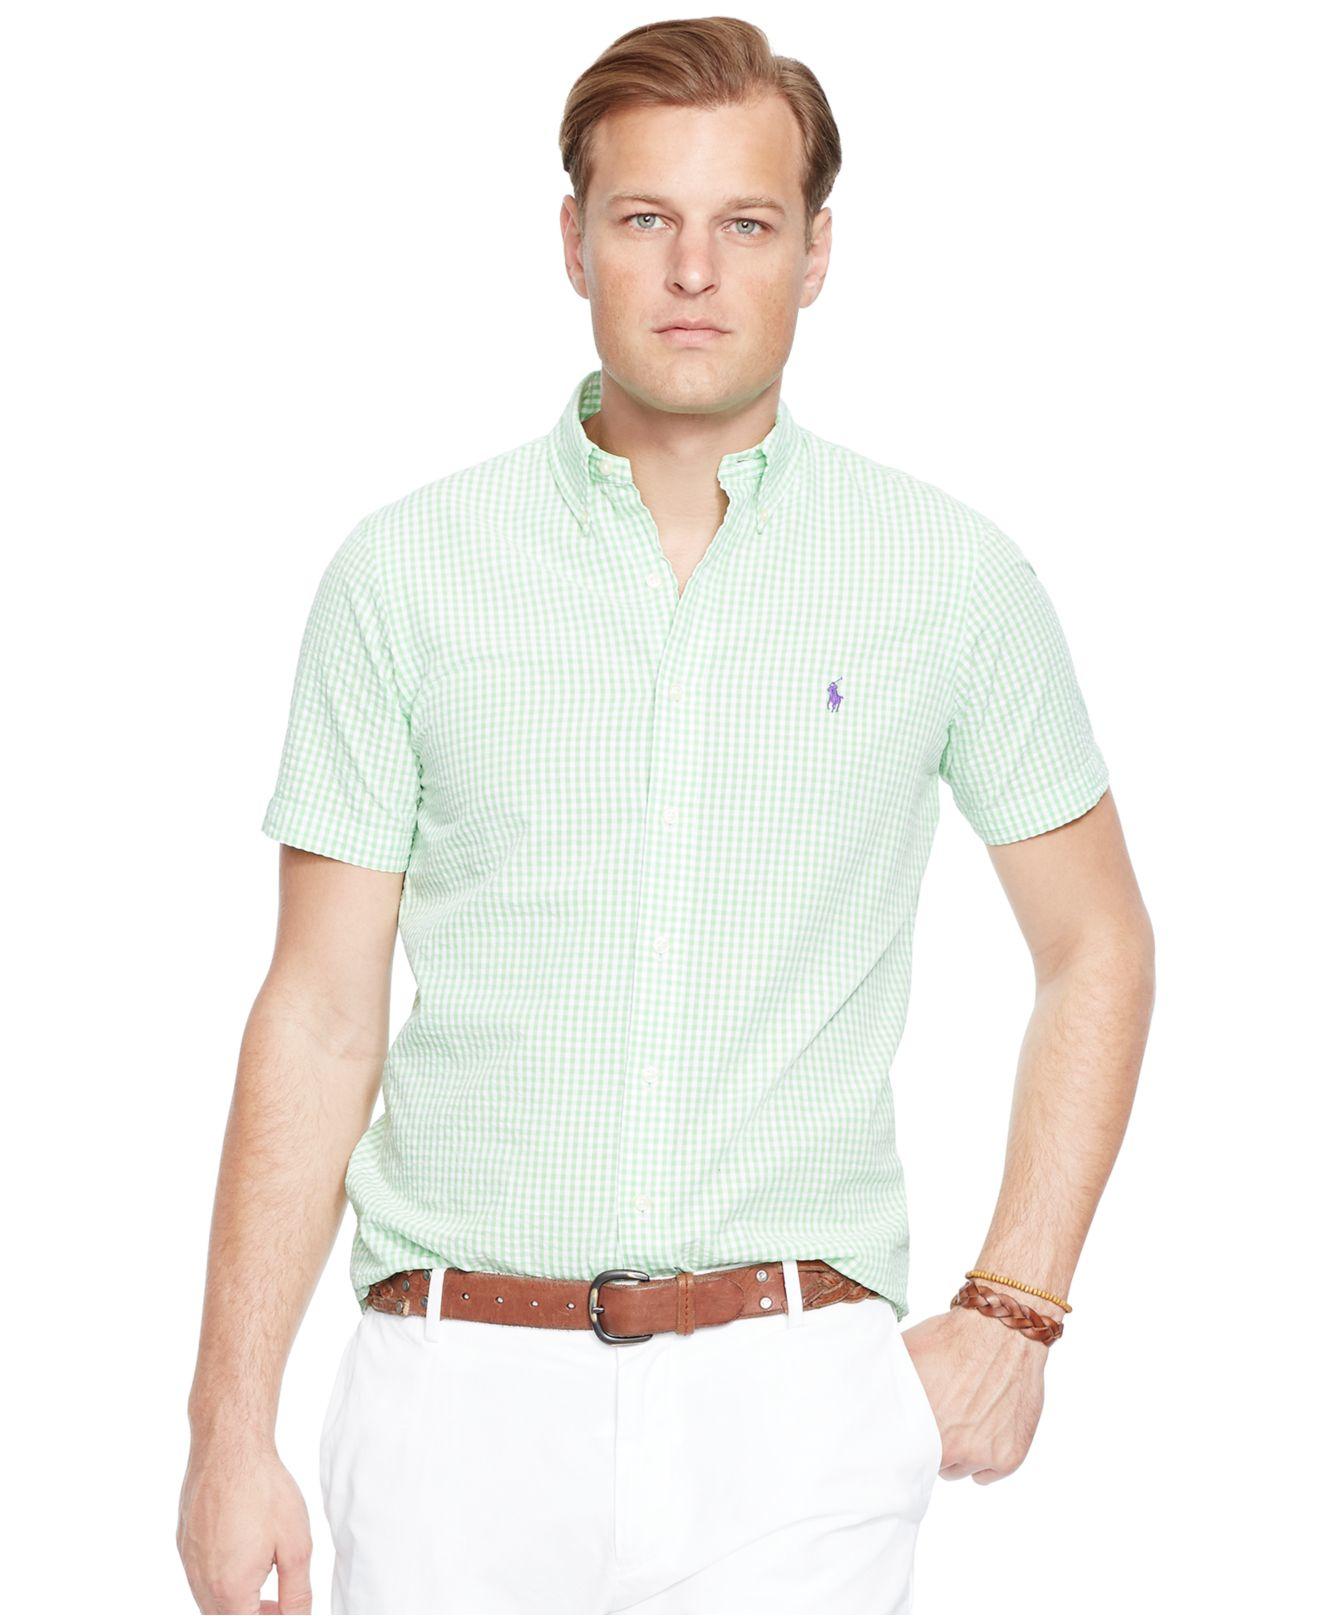 lyst polo ralph lauren big tall check seersucker shirt in green for men. Black Bedroom Furniture Sets. Home Design Ideas